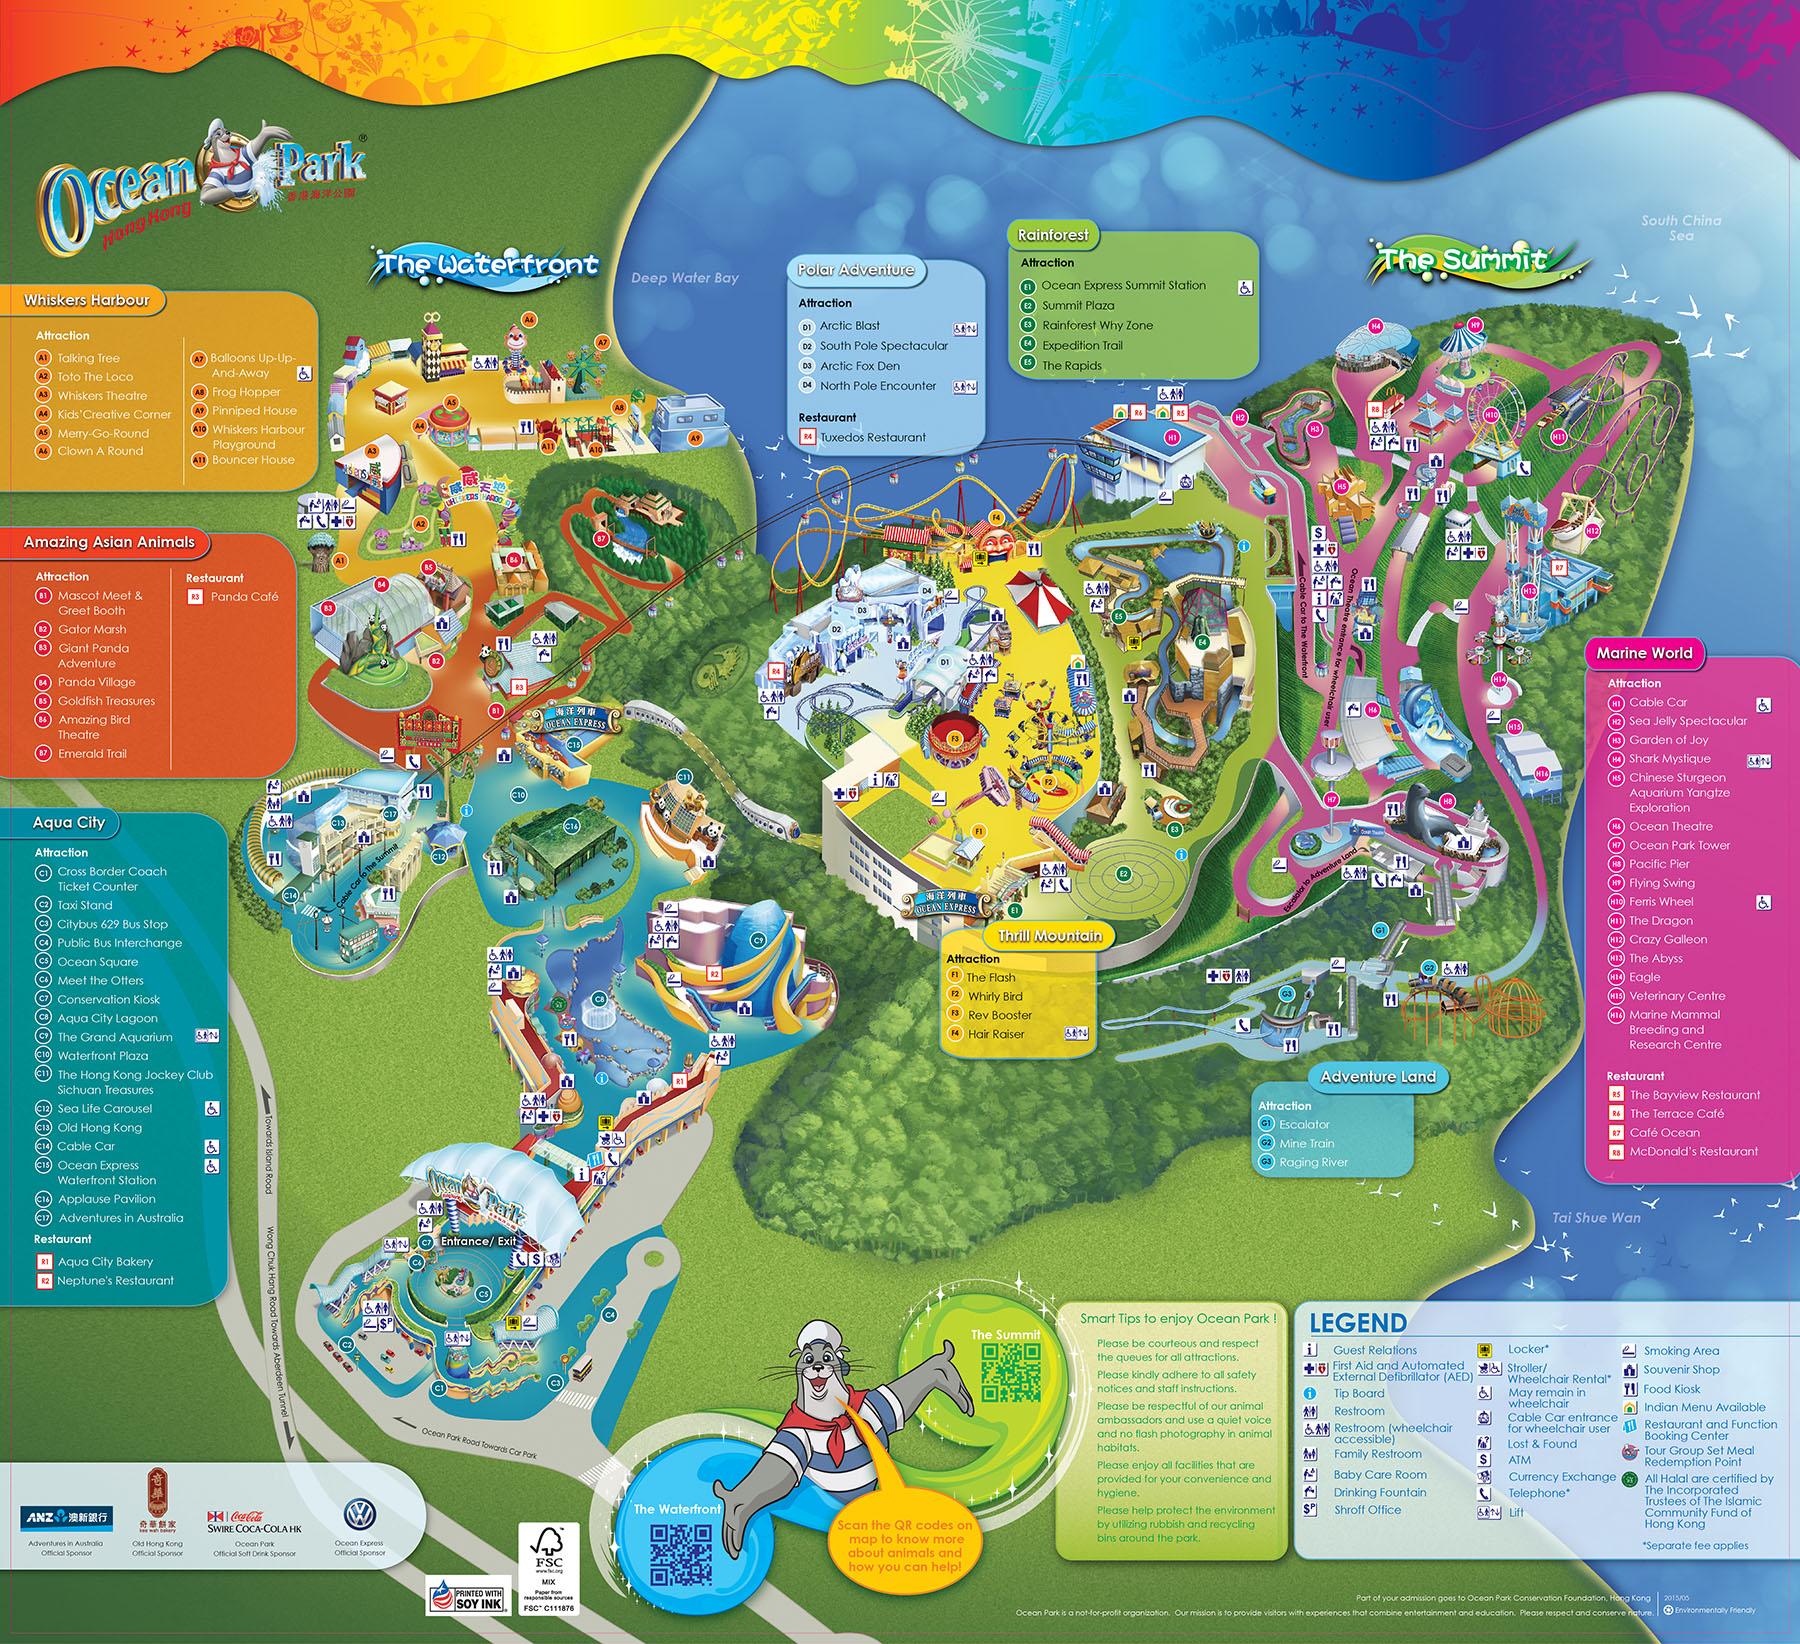 Zoos hong kong ocean park ocean park map 2010 map 2015 city hong kong gumiabroncs Image collections